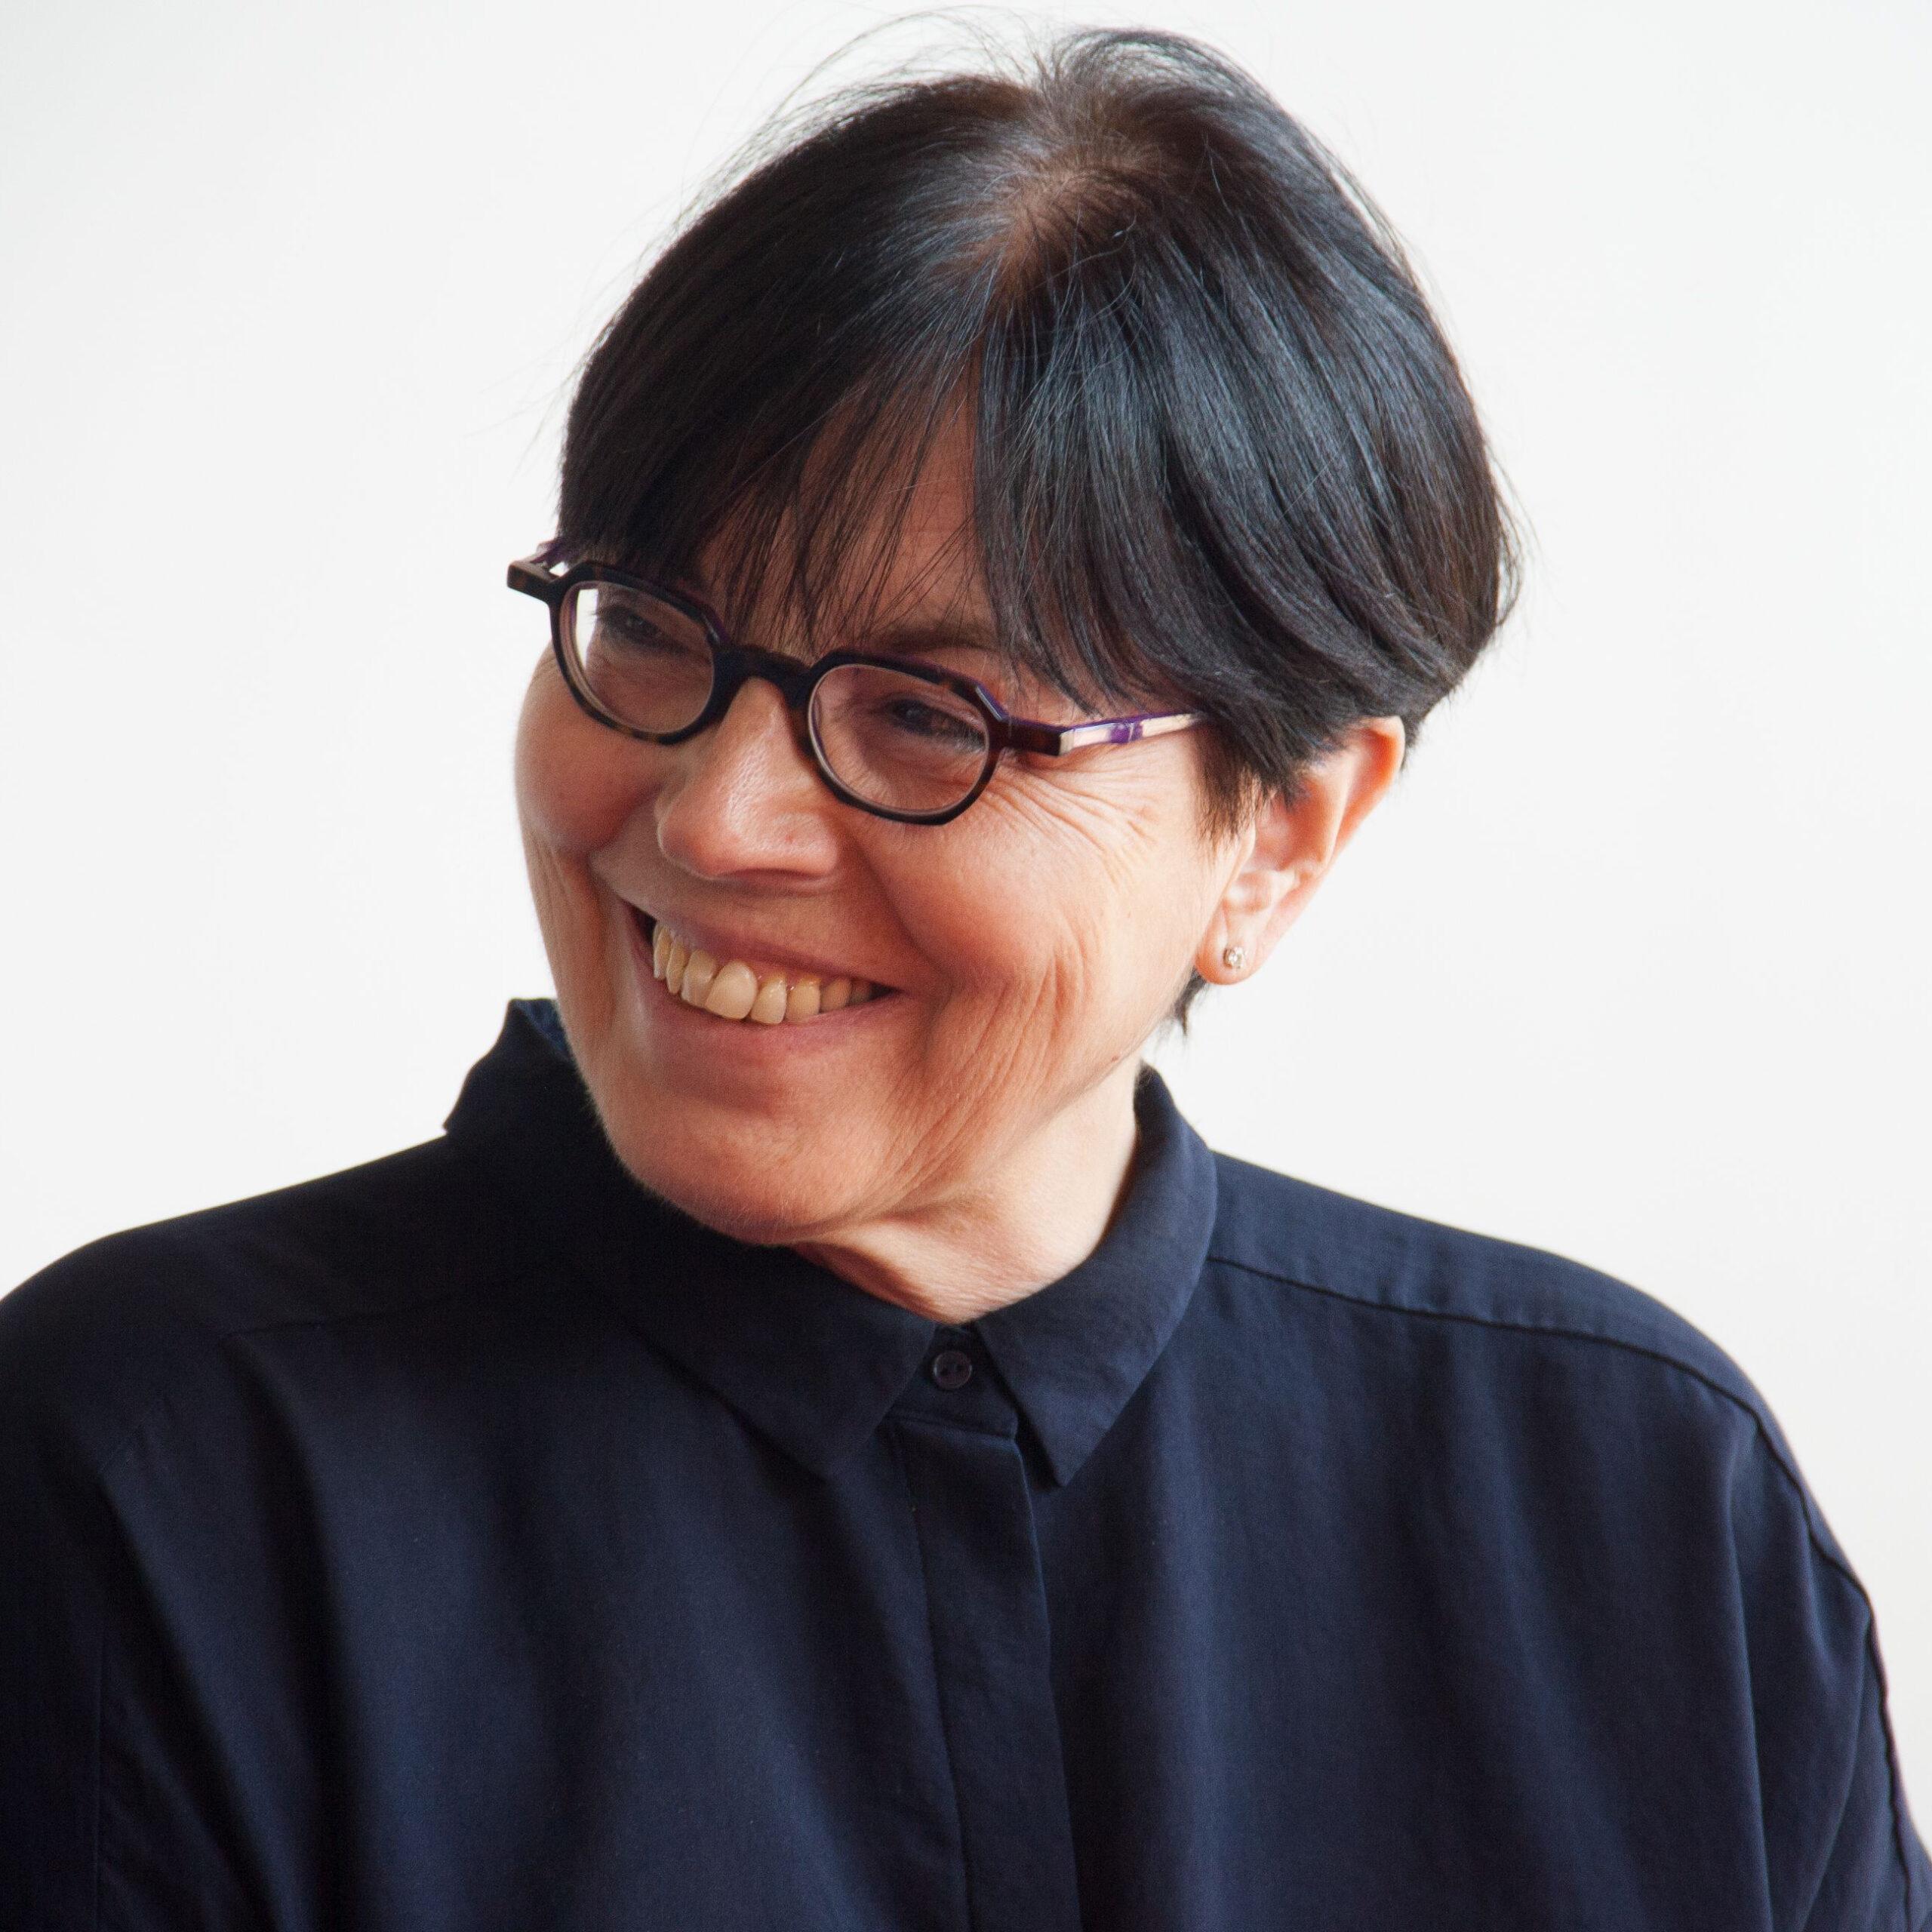 Giovanna Calvenzi